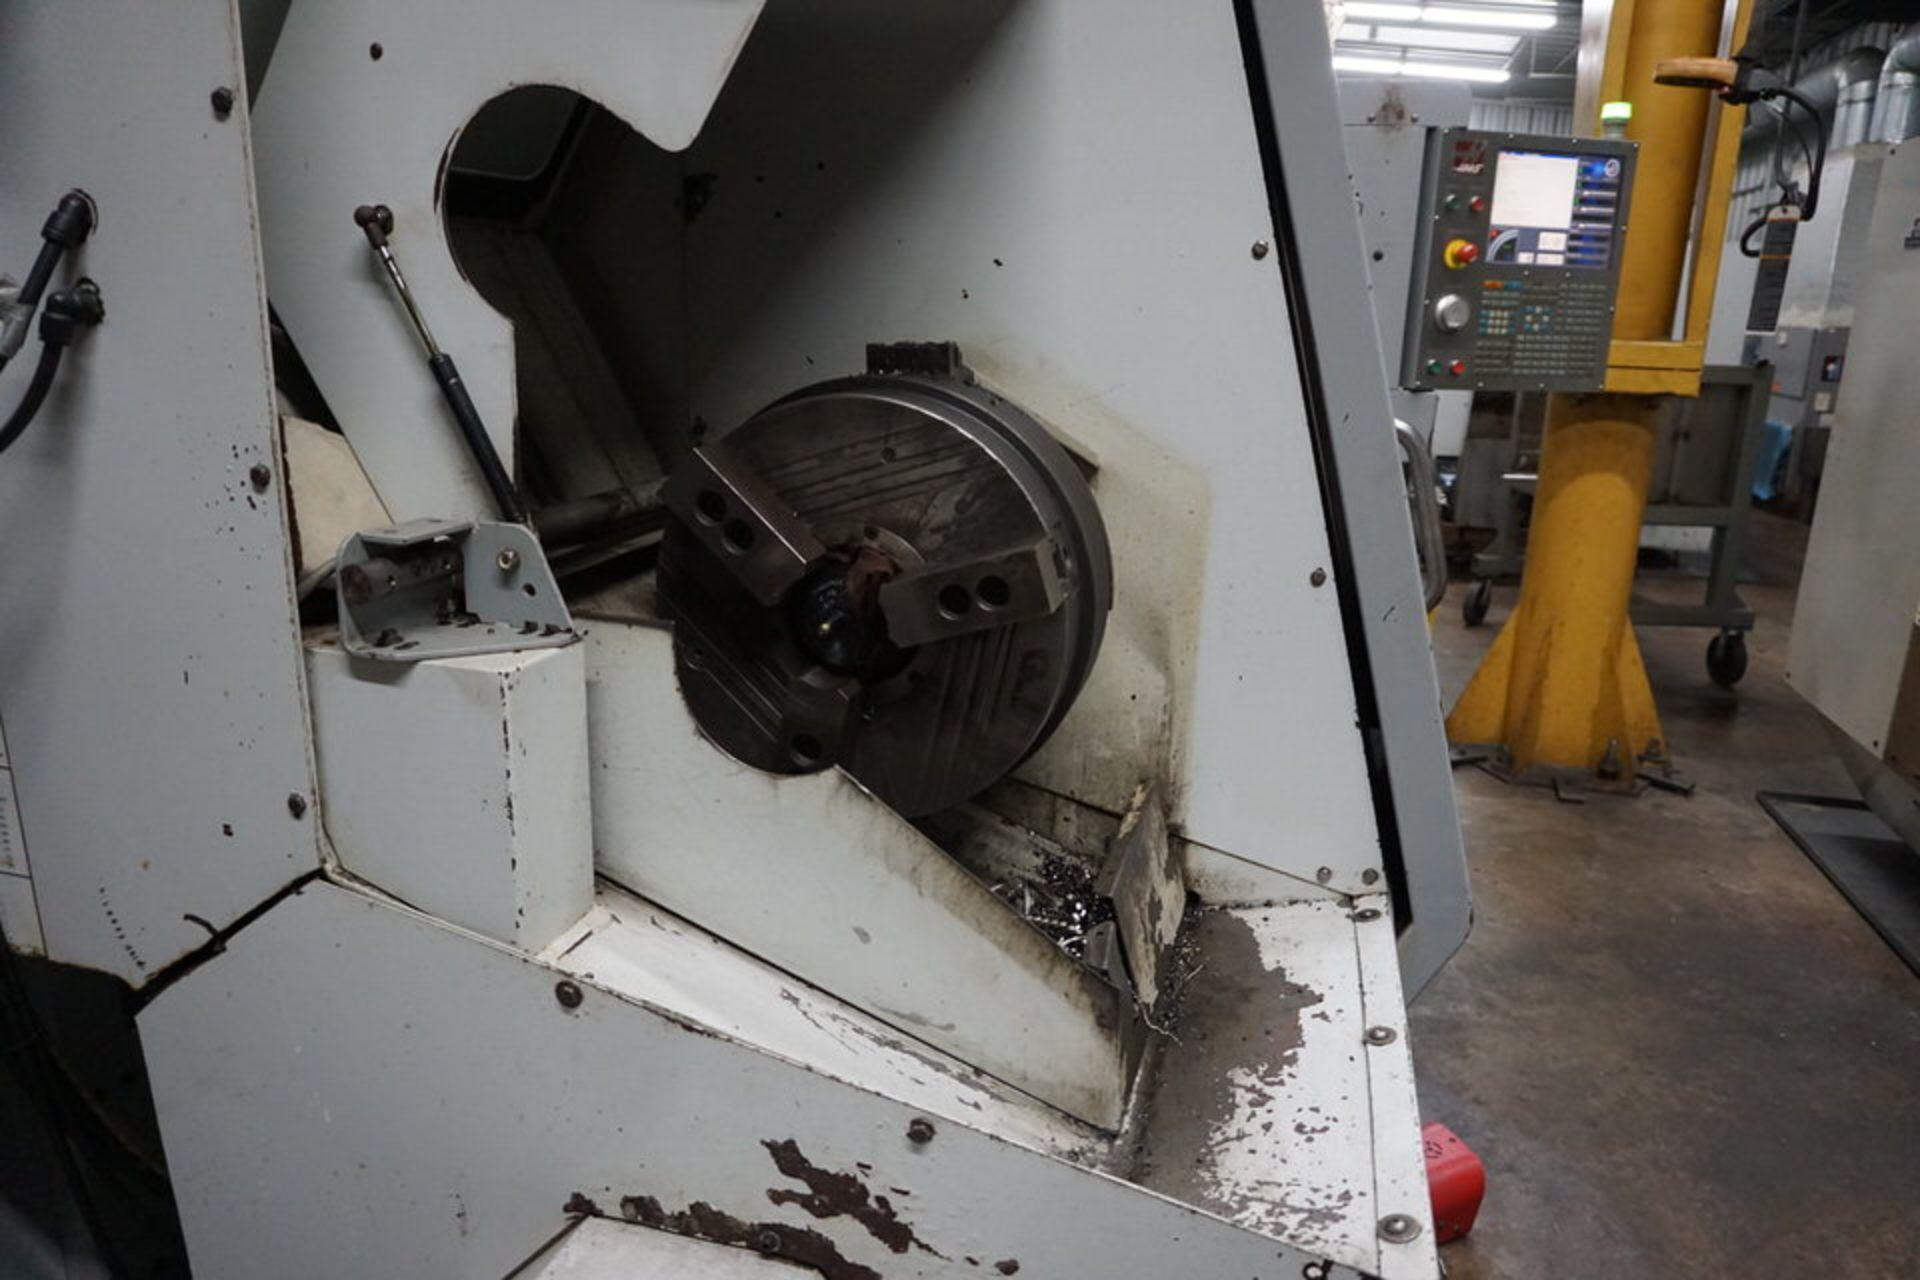 HAAS DOUBLE CHUCK SL-30B CNC LATHE W/ (2) 3 JAW CHUCK, 12 STATION TURRET & HAAS CNC CTRL - Image 4 of 6